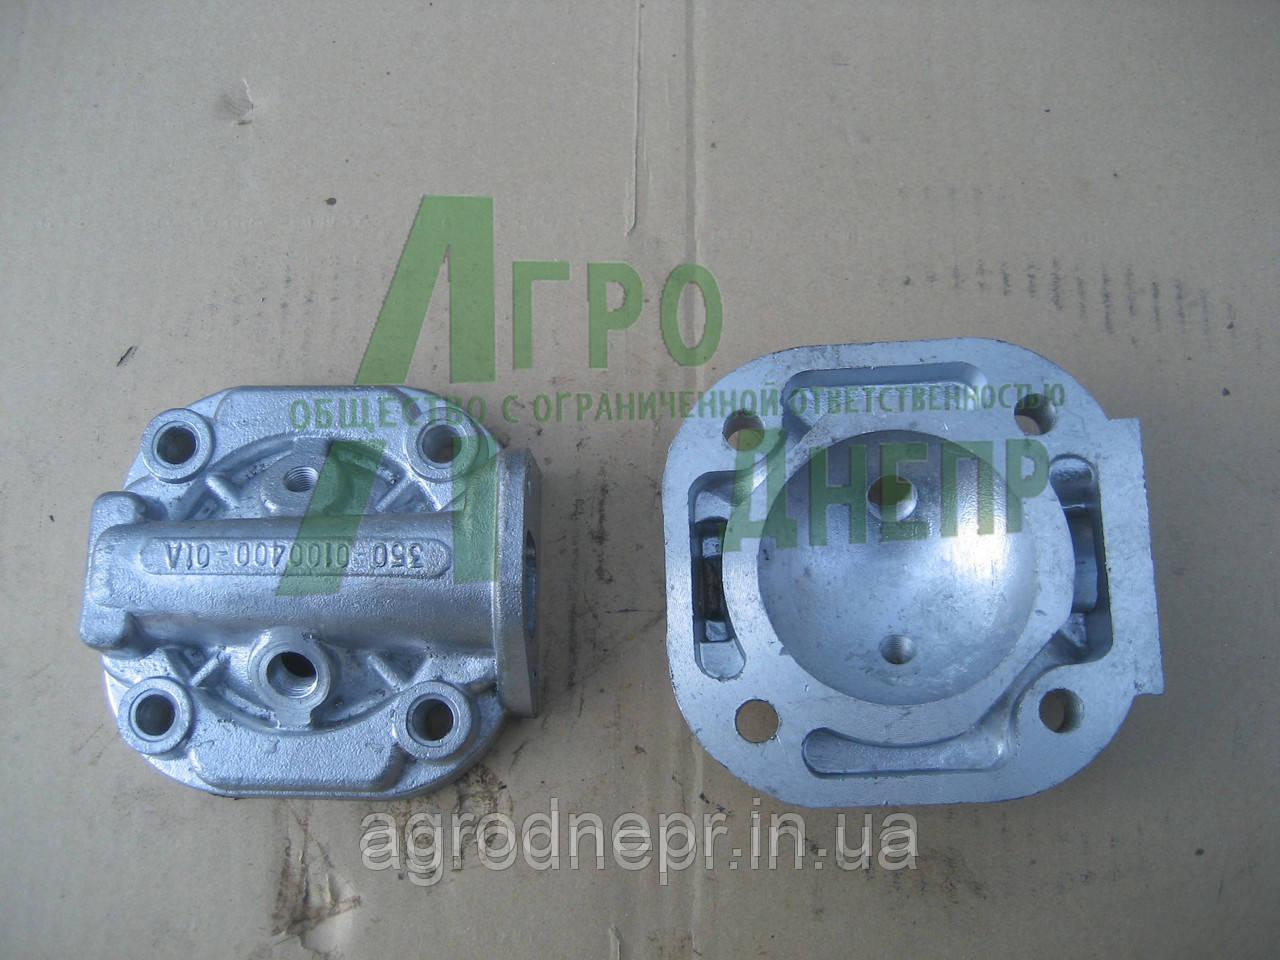 Головка цилиндра ПД-10 350.01.004.00 Нового образца